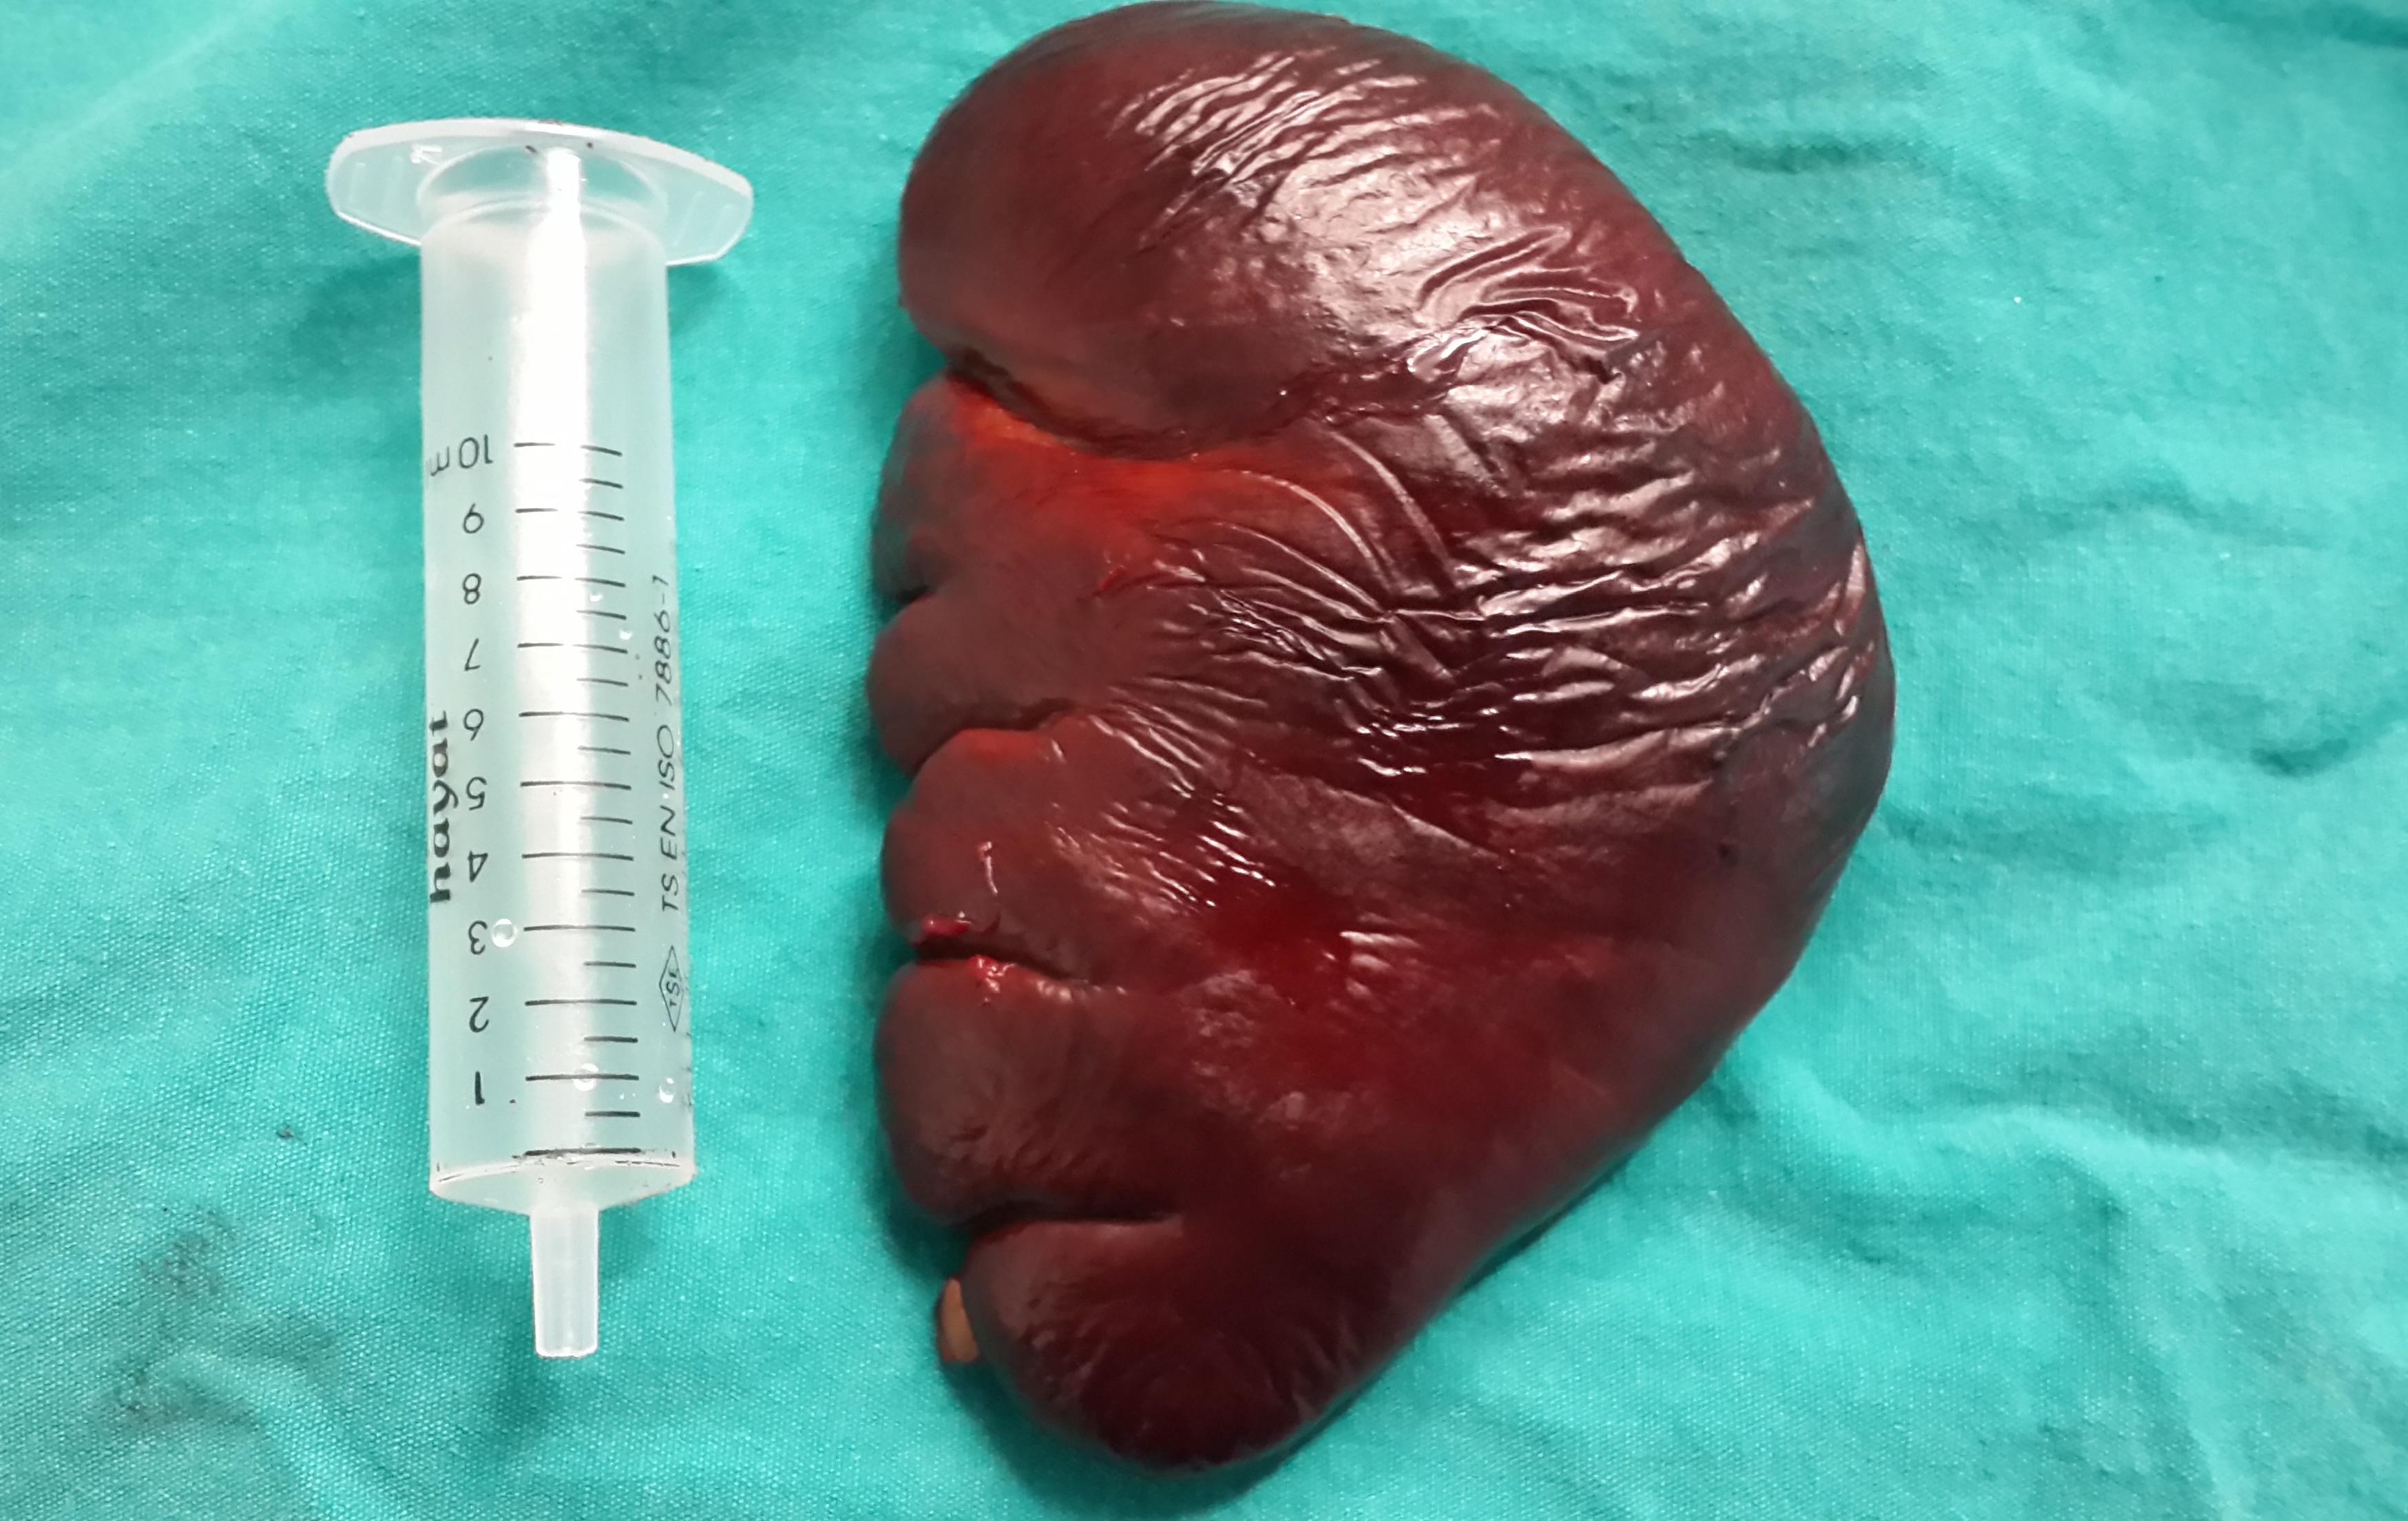 cureus transvaginal mini laparoscopic splenectomy